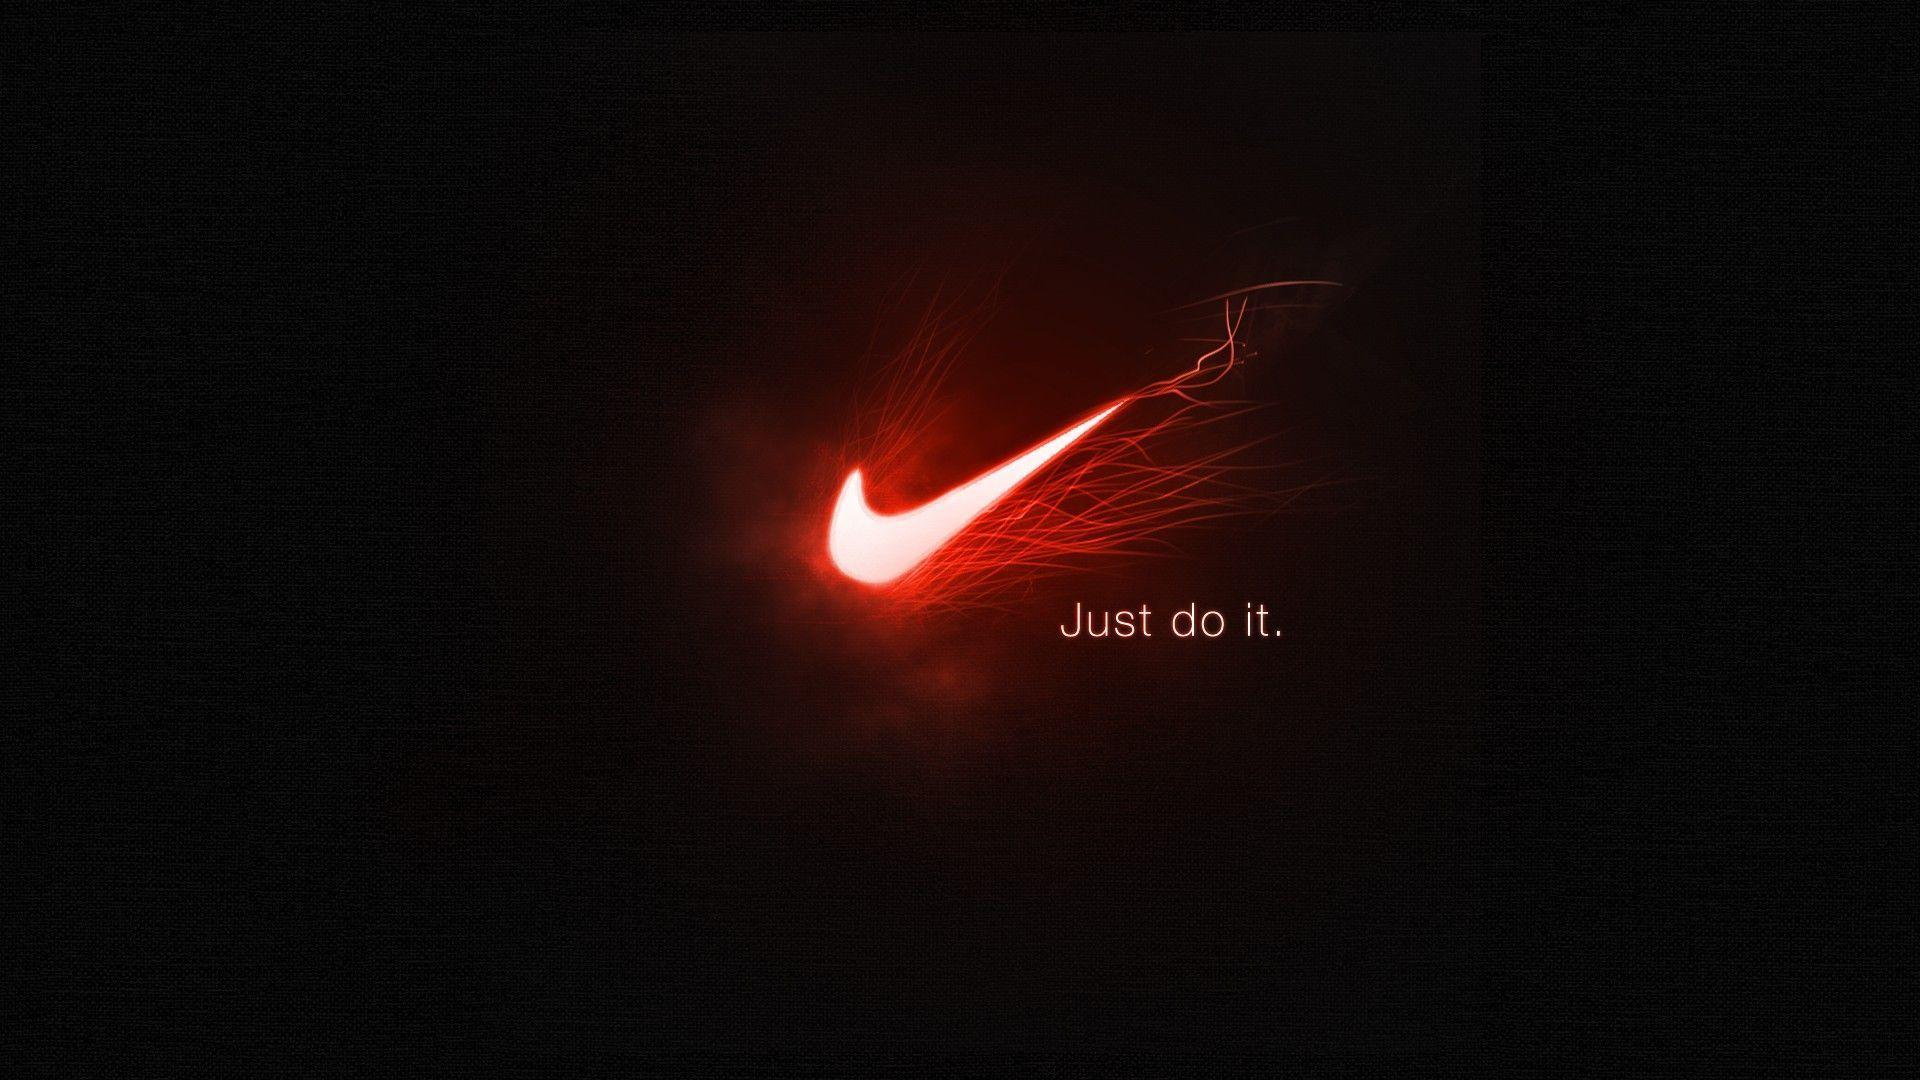 Fantastic Wallpaper Macbook Nike - zxpTwwx  You Should Have_801392.jpg